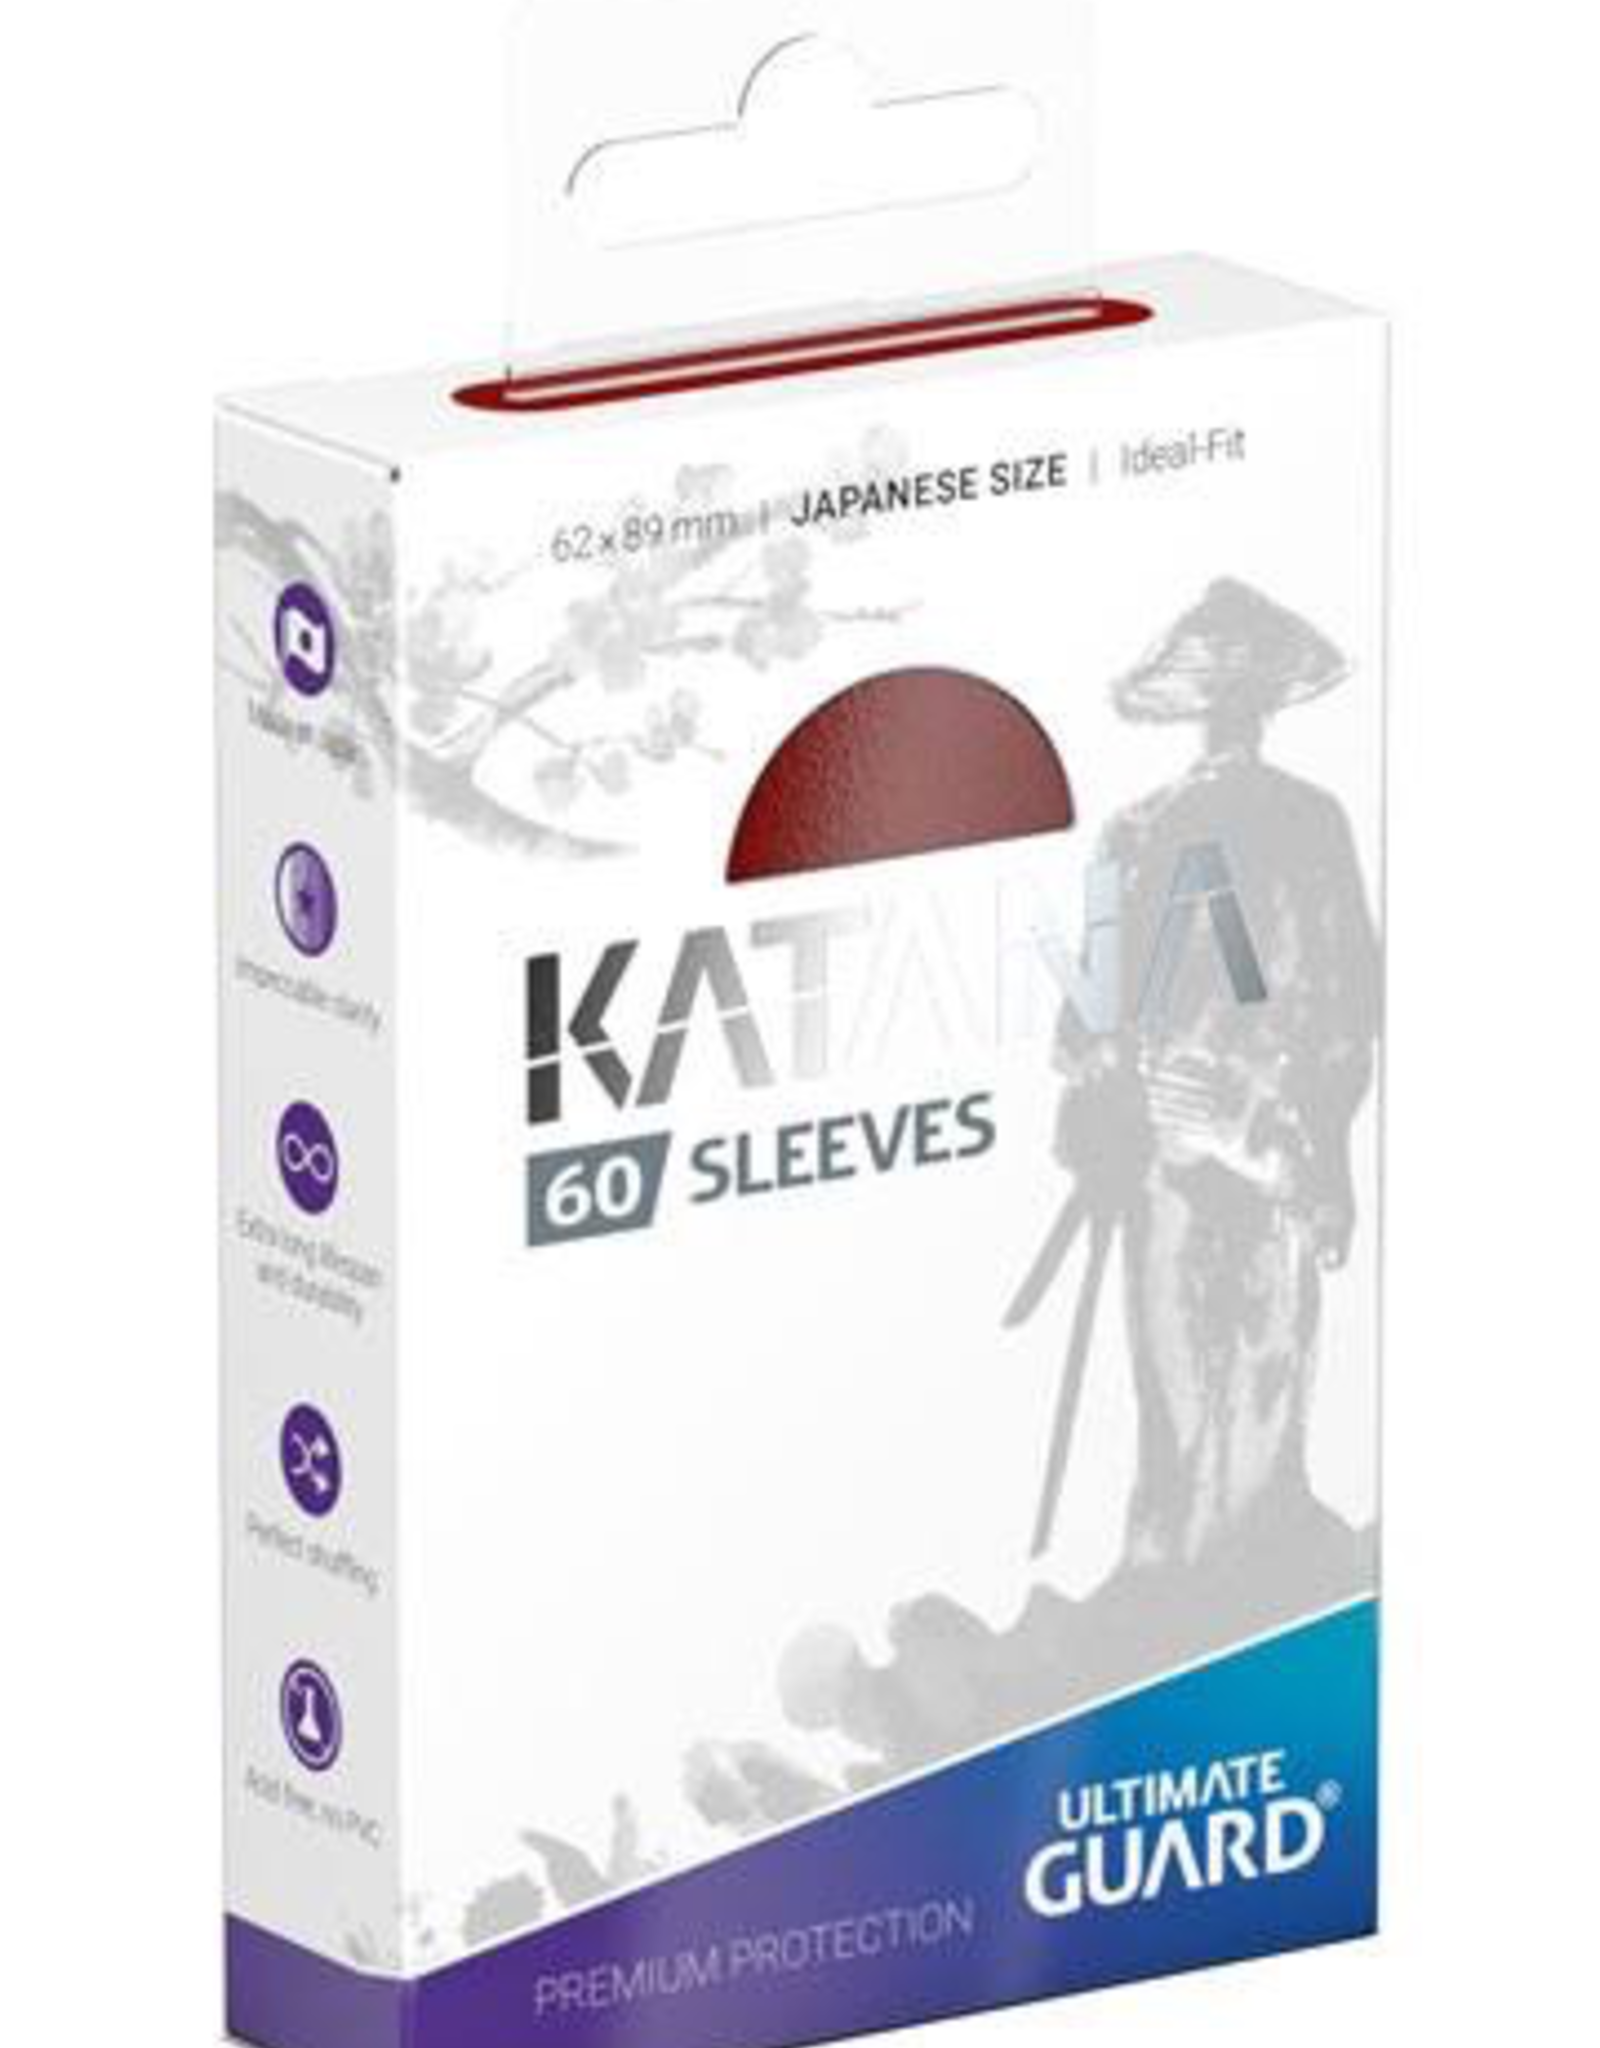 UG - Small Sleeves Ultimate Guard Katana Sleeves Japanische Größe Rot<br /> (60)